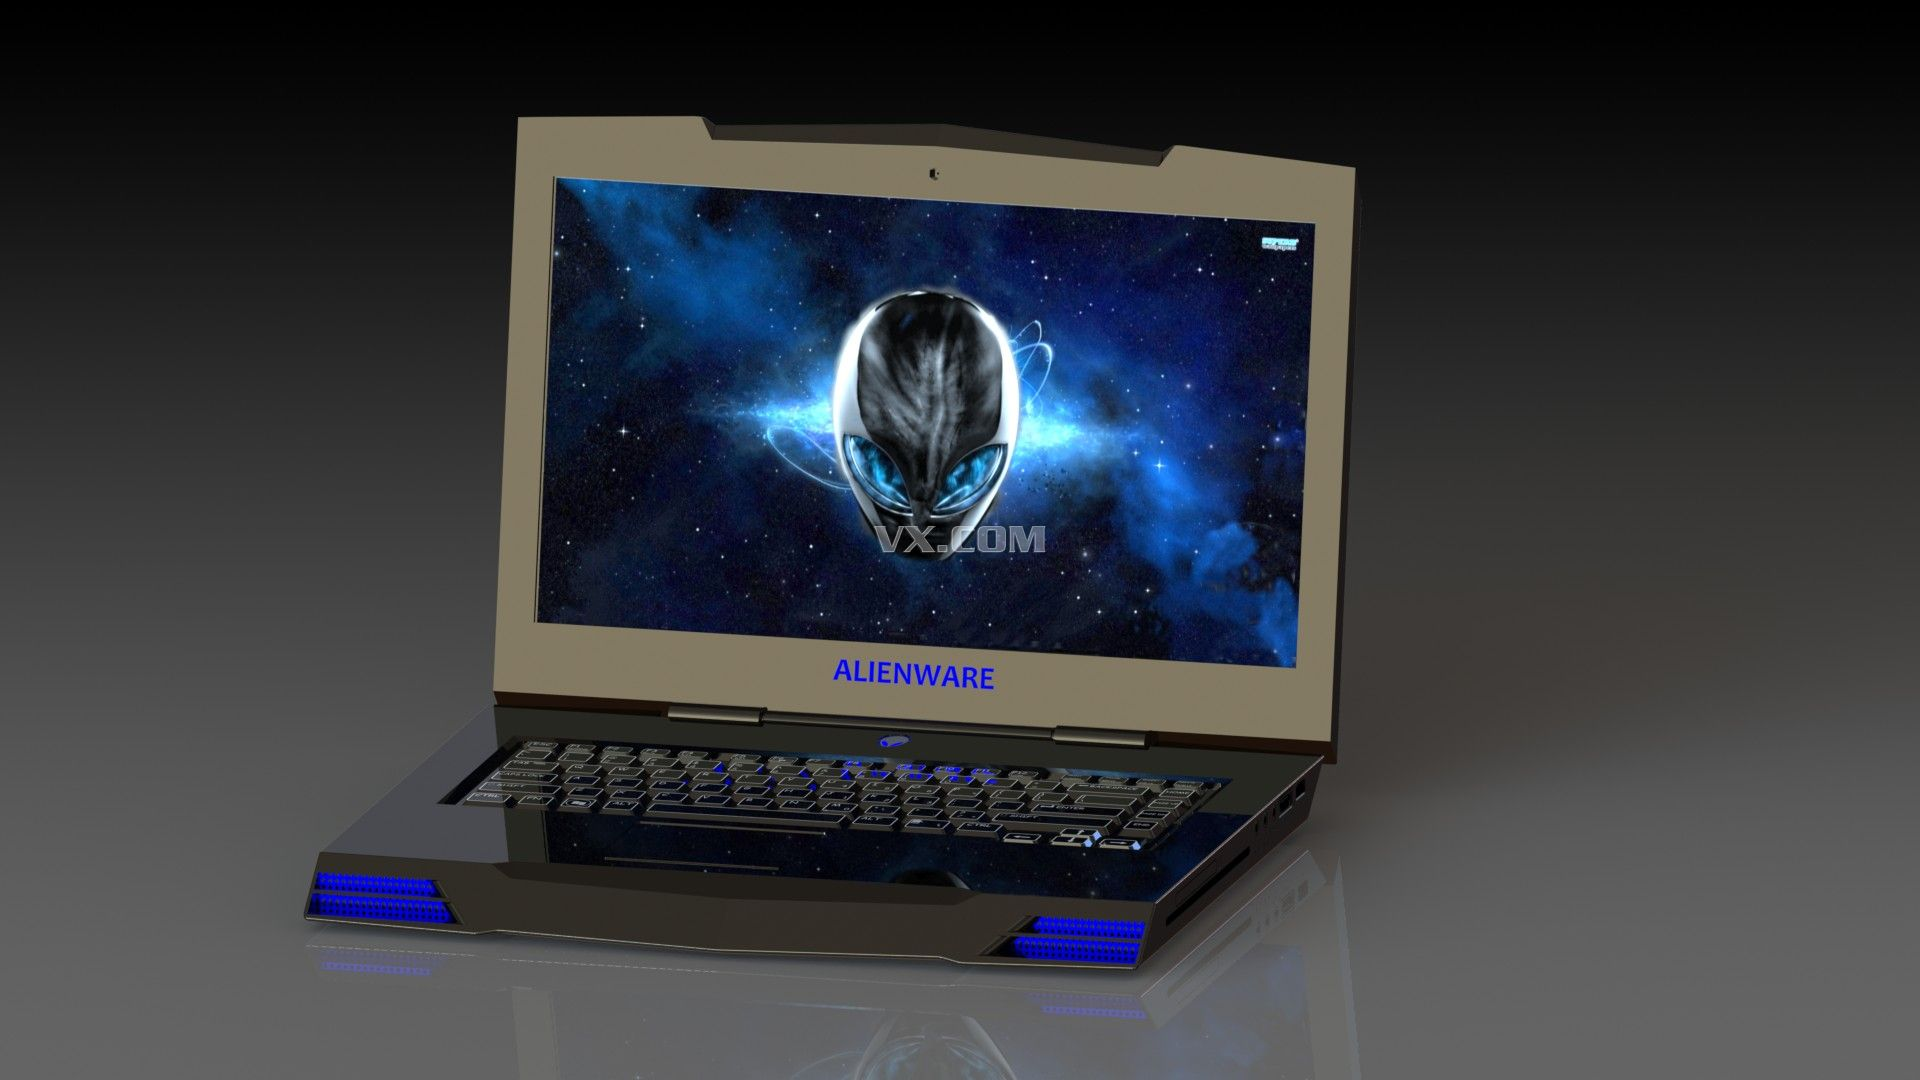 Dell Wallpaper 1280x800 furthermore Alienware M17x R3 GTX 580M I7 2820QM 60088 0 besides Lenovo 1280x1024 3686 besides Jaki Piornik Do Szkoly Wybrac further 8445. on dell alienware